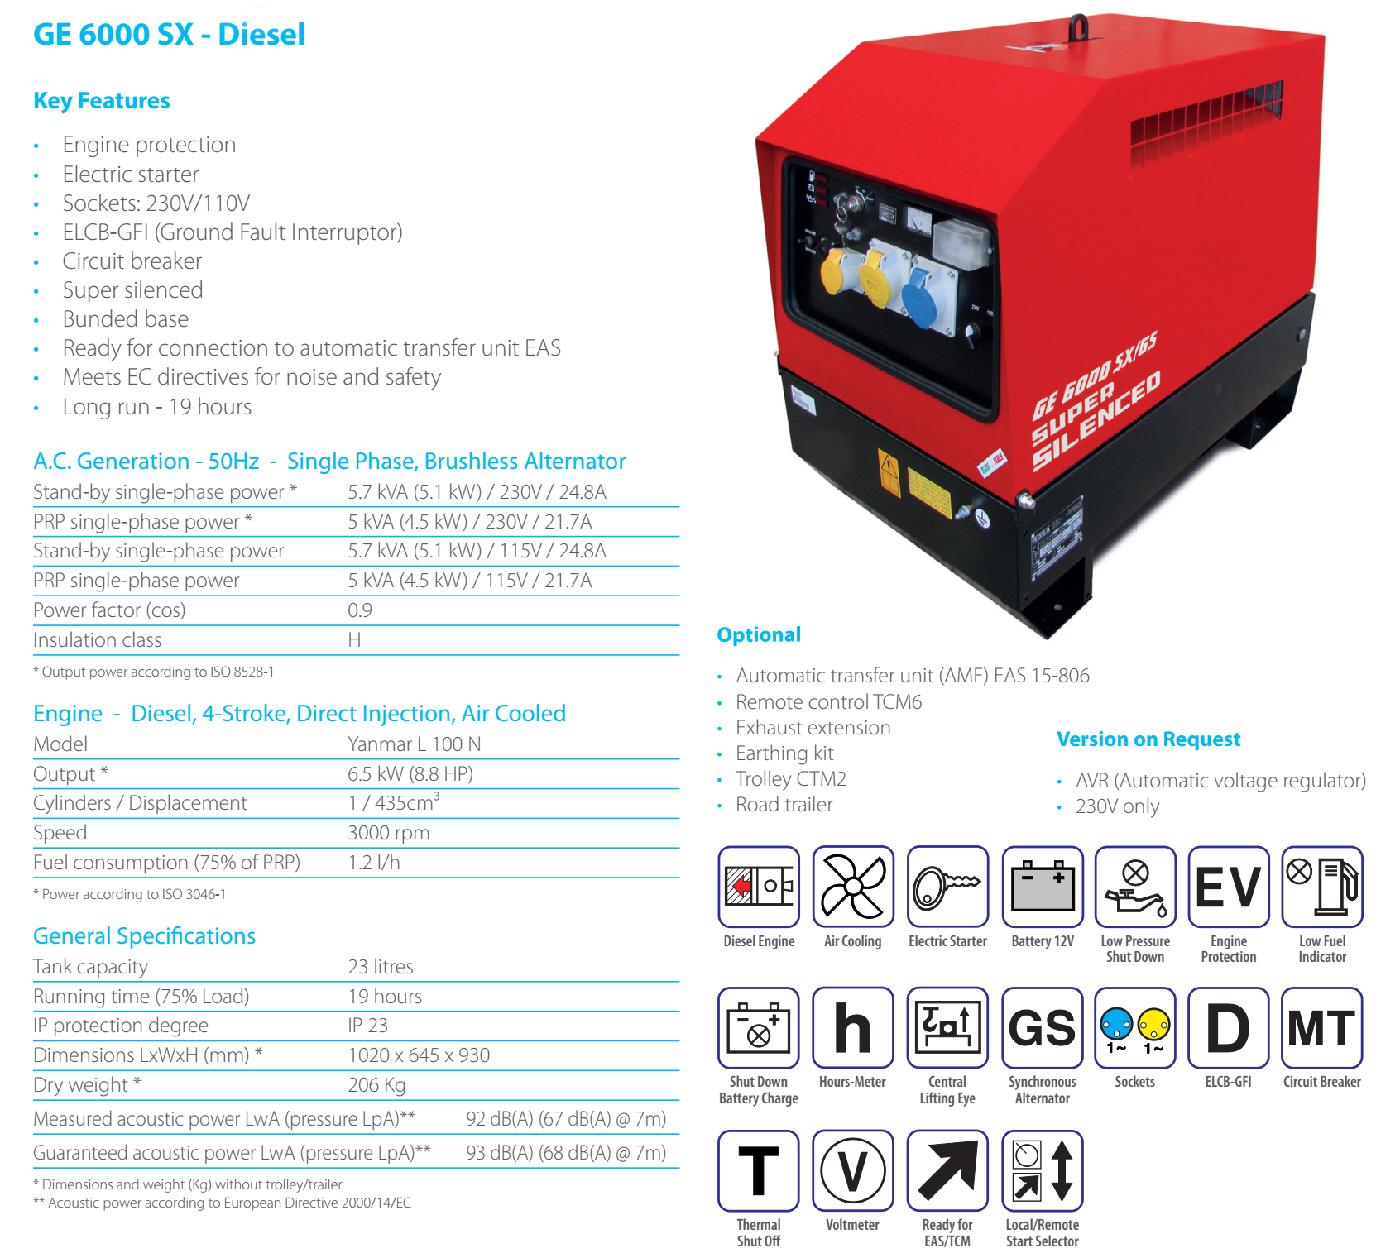 Mosa ge 6000 sx gs eas generating set diesel wecs ltd for Mosa ge 3000